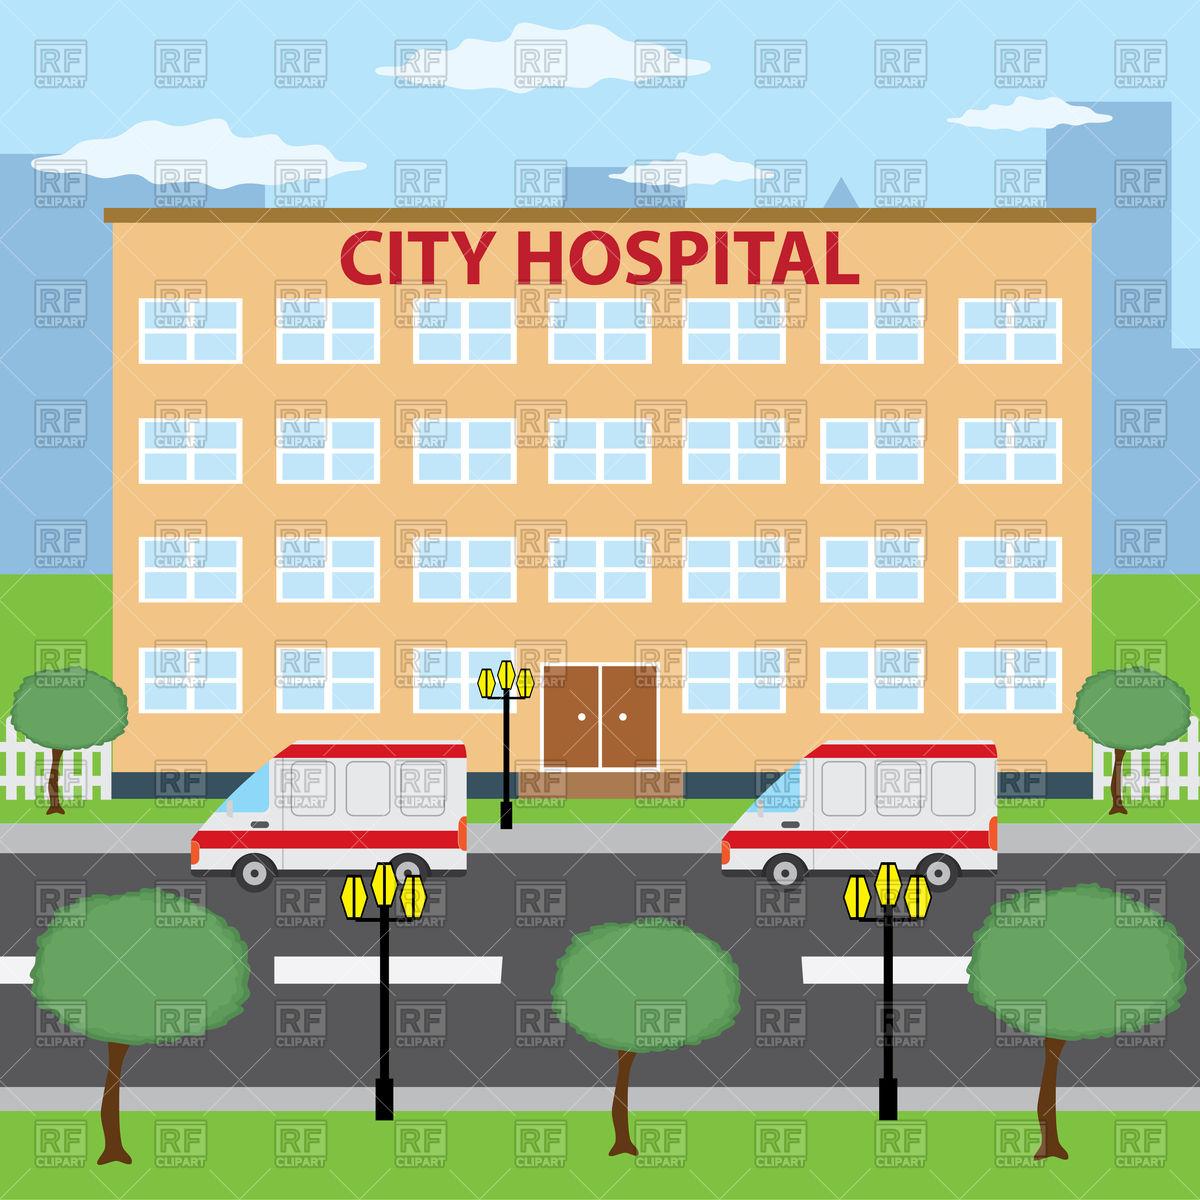 1200x1200 Ambulance Cars Parking Near City Hospital Building Vector Image